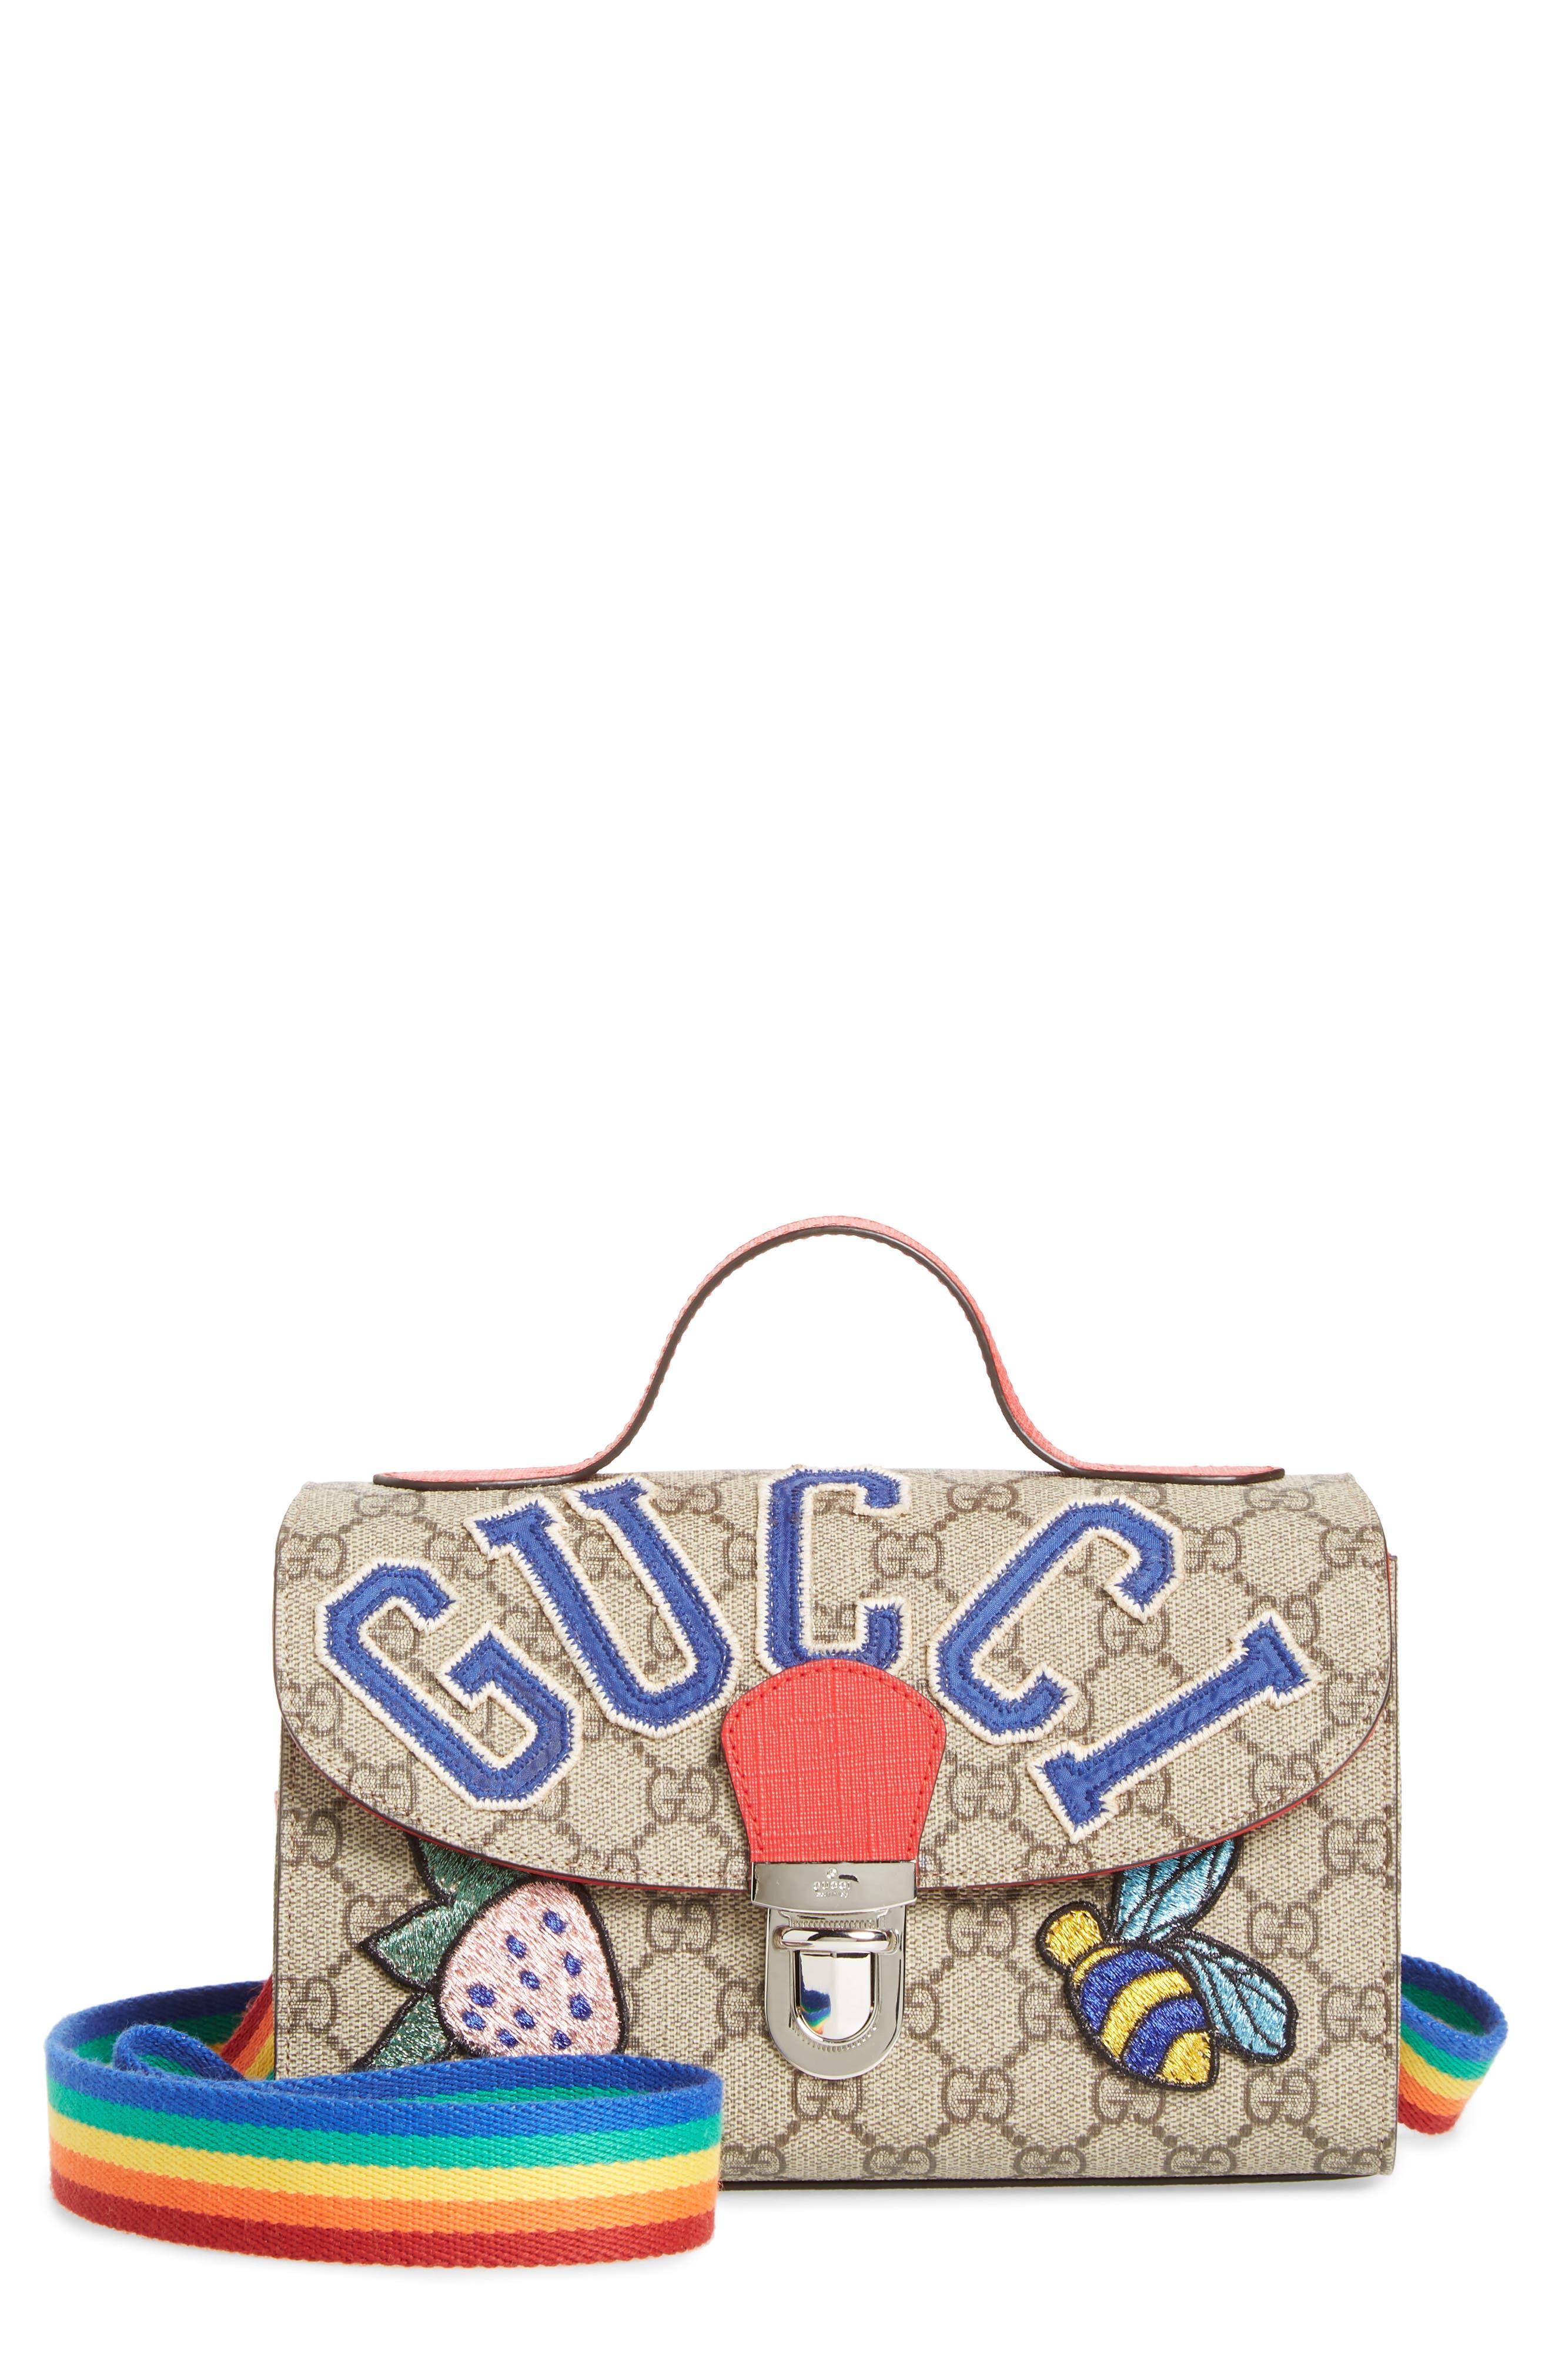 GUCCI Junior GG Supreme Canvas Top Handle Bag, Main, color, NERO/ VRV